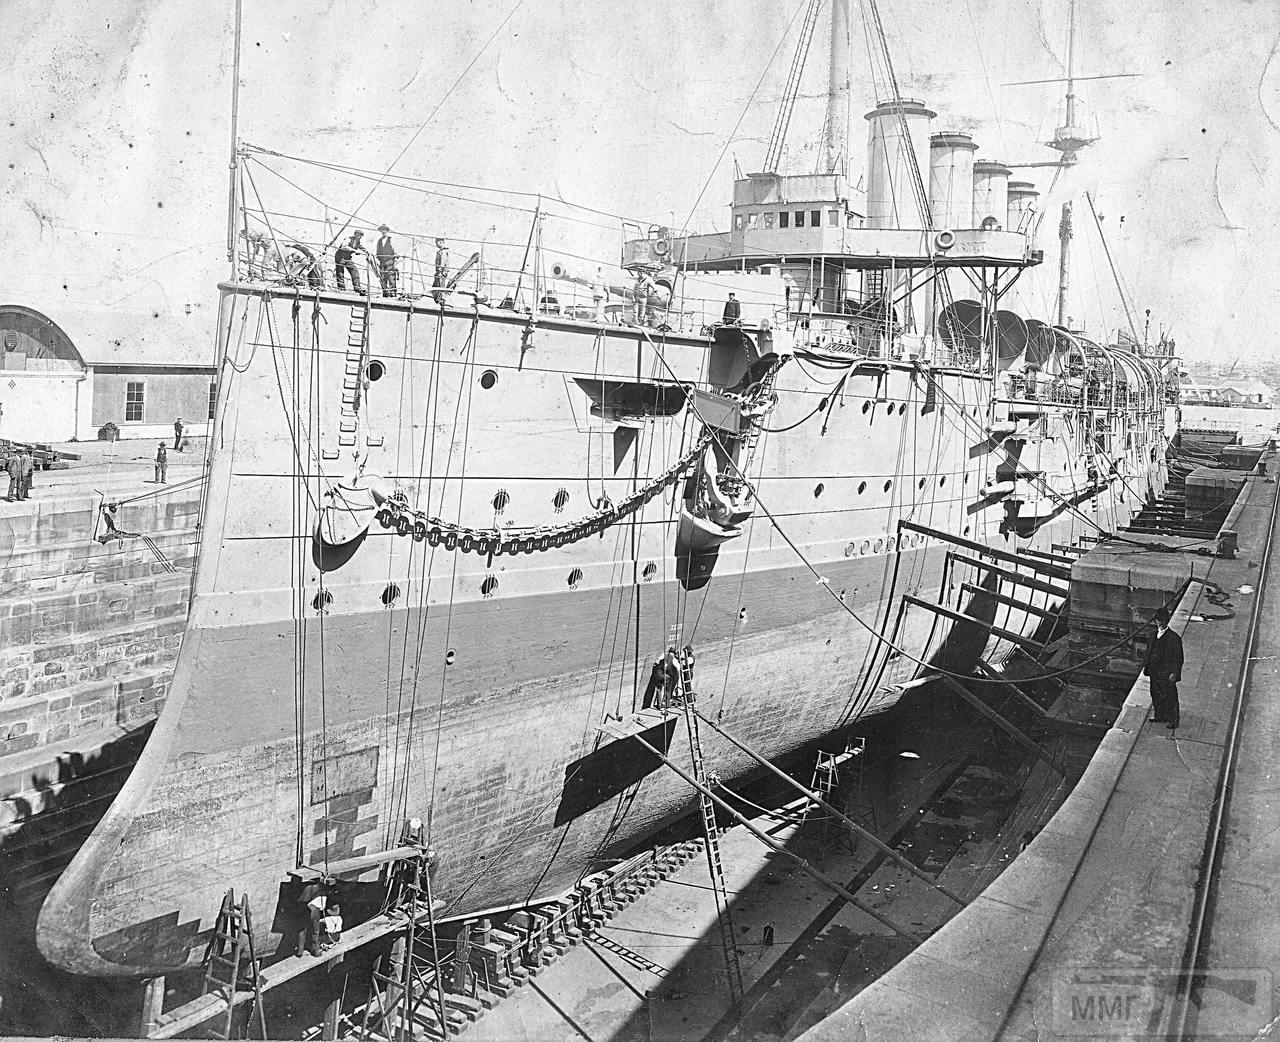 109547 - HMS Euryalus